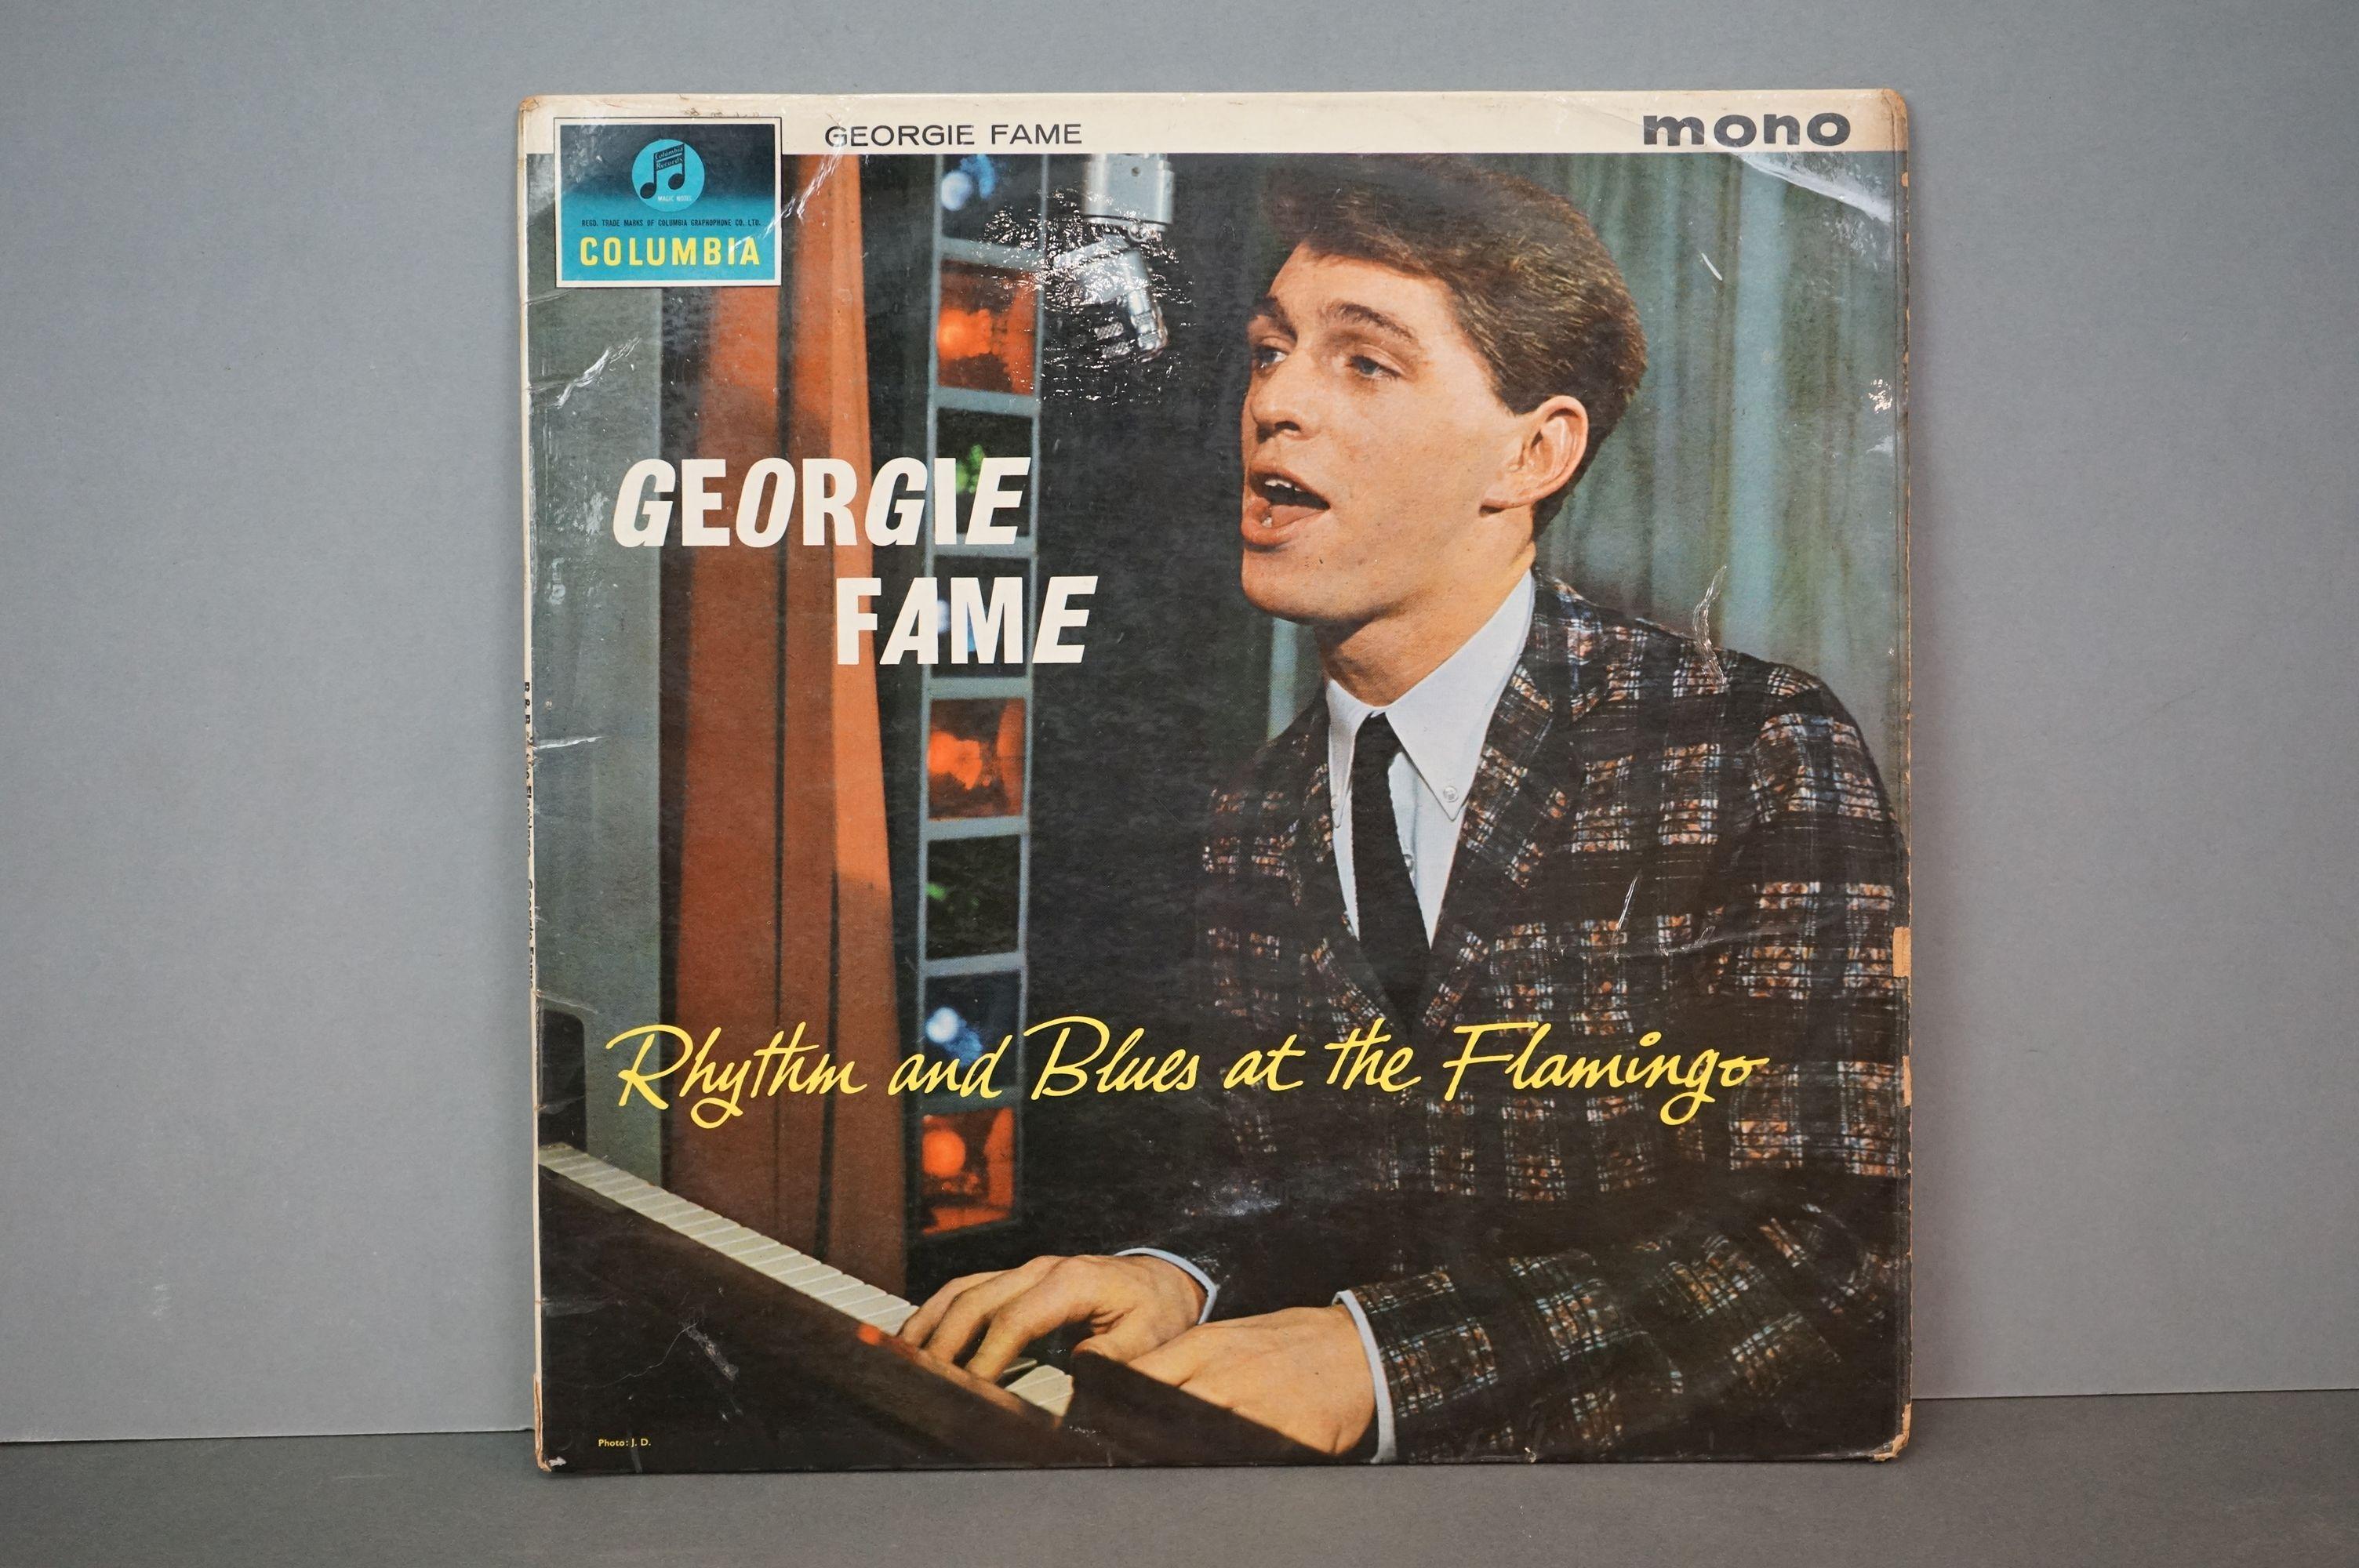 Vinyl - Georgie Fame Rhythm And Blues At The Flamingo (Columbia 33 SX 1599). Sleeve & Vinyl VG-